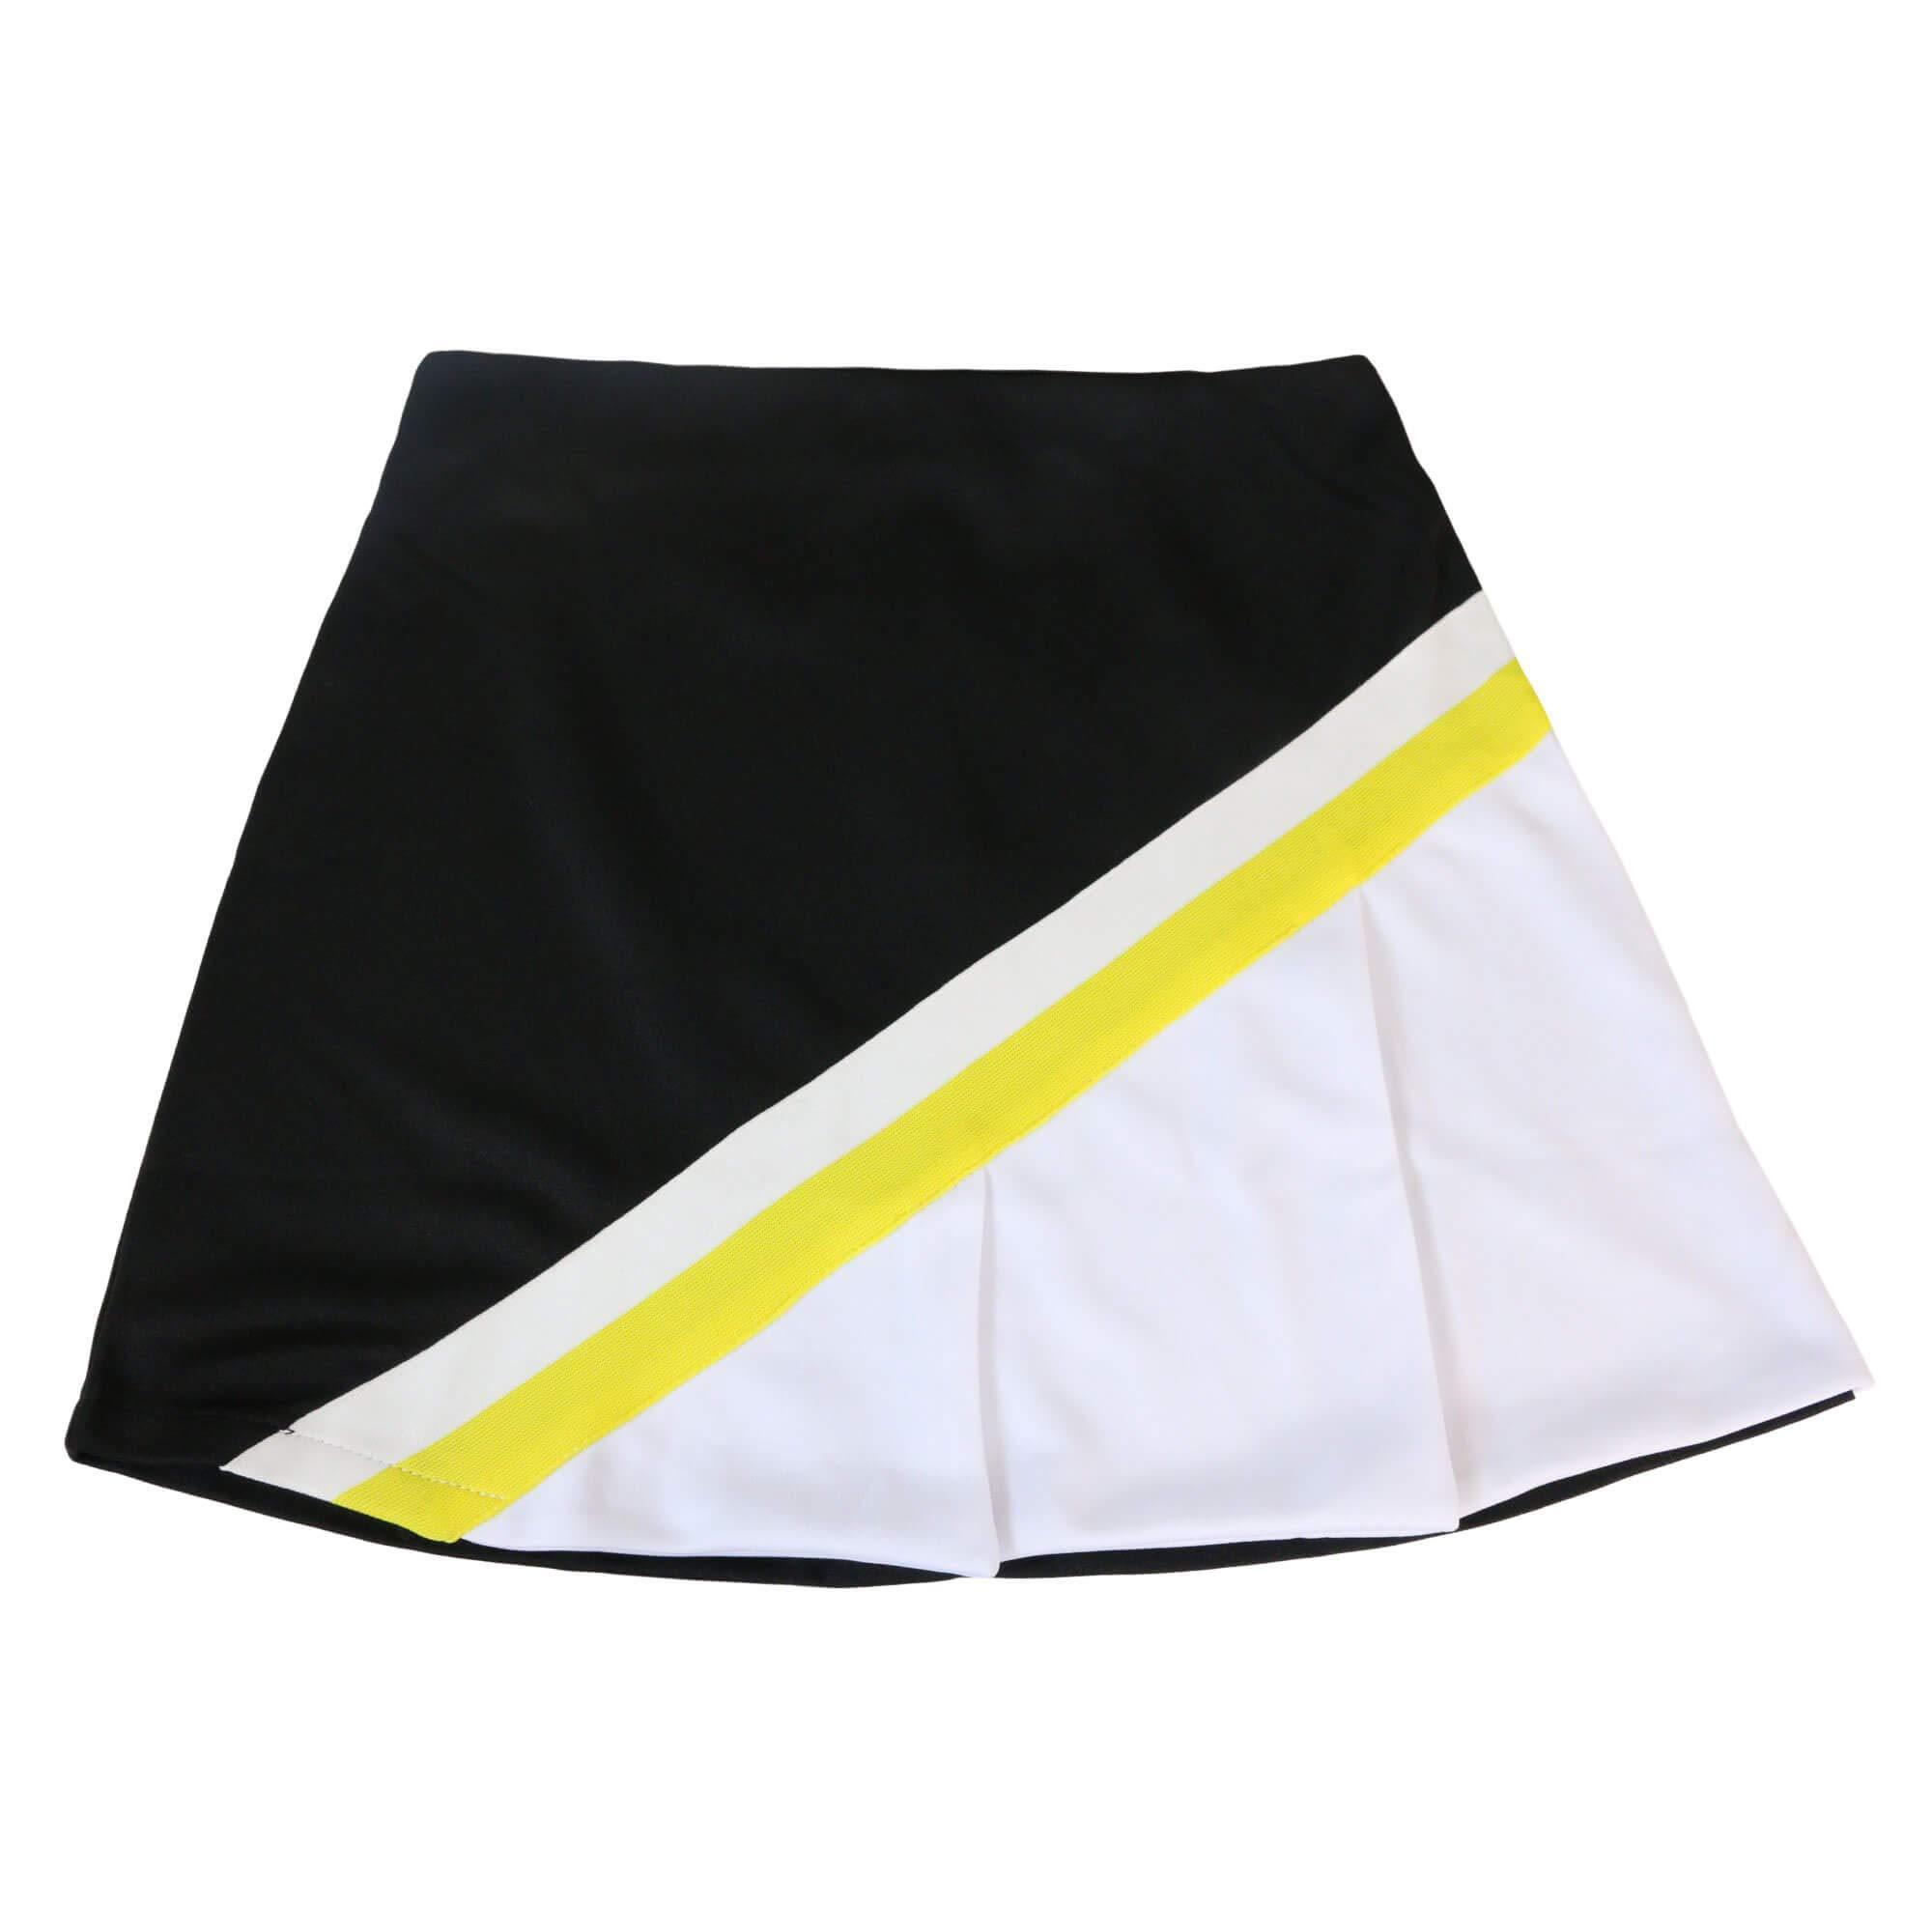 Danzcue Child Cheerleading A-Line Pleat Skirt, Black/White, X-Small